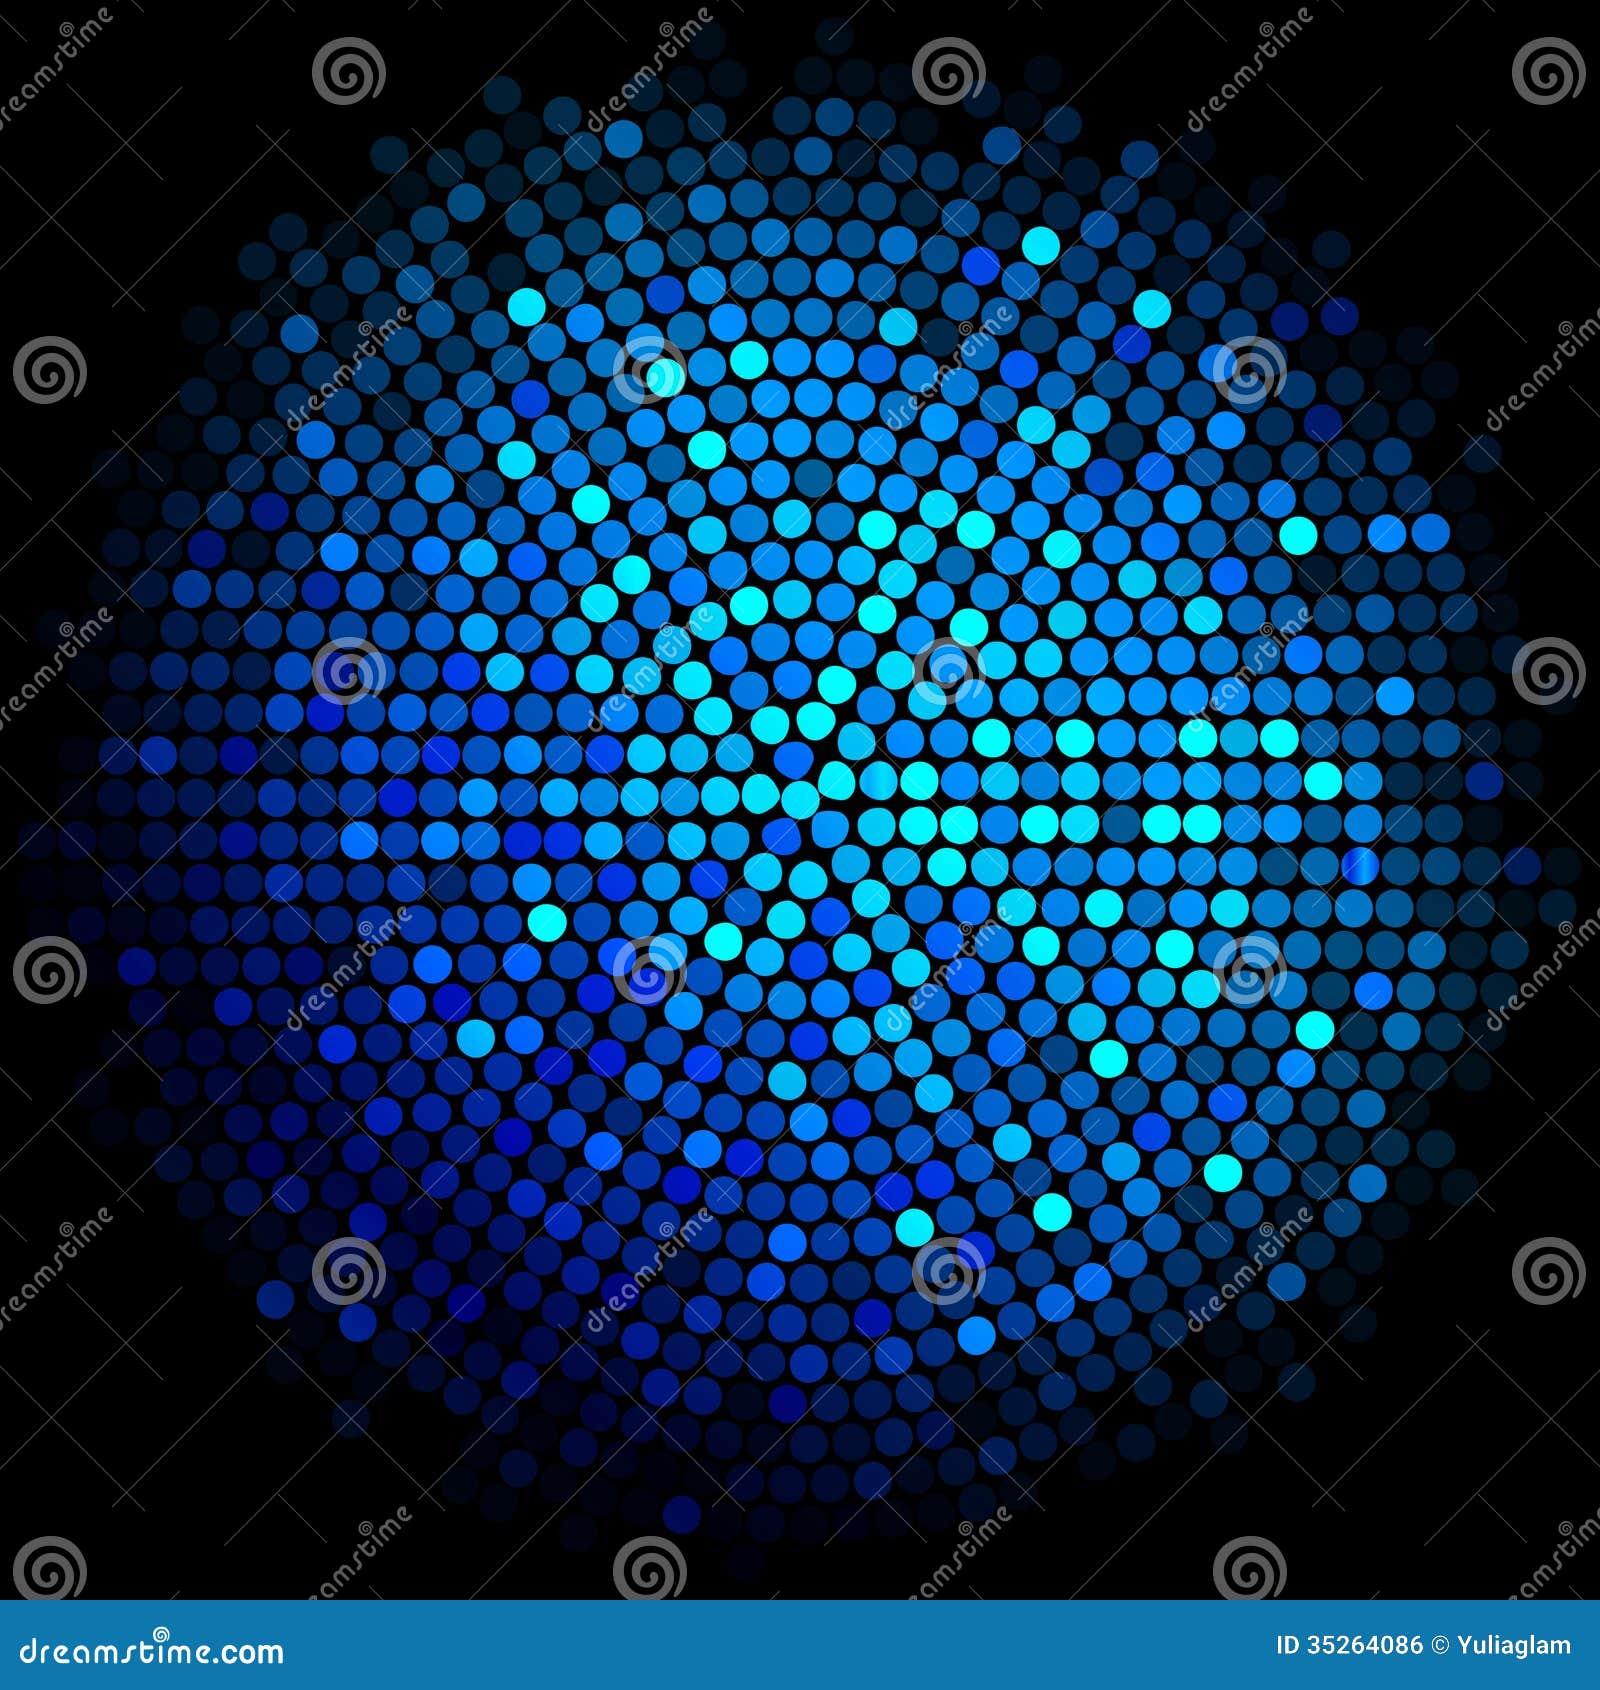 Blue Disco Lights Background Royalty Free Stock Image ... | 1300 x 1390 jpeg 311kB